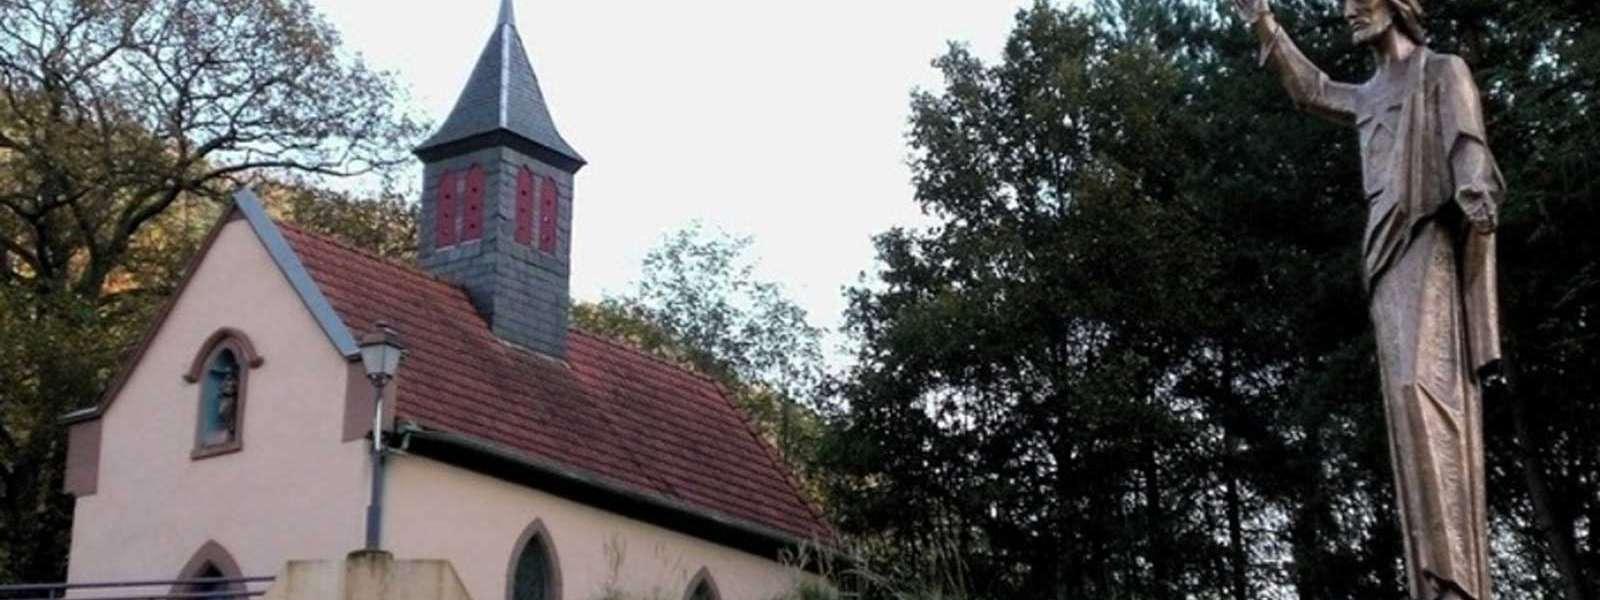 Chapelle Notre Dame du Wasenberg, Niederbronn-les-Bains